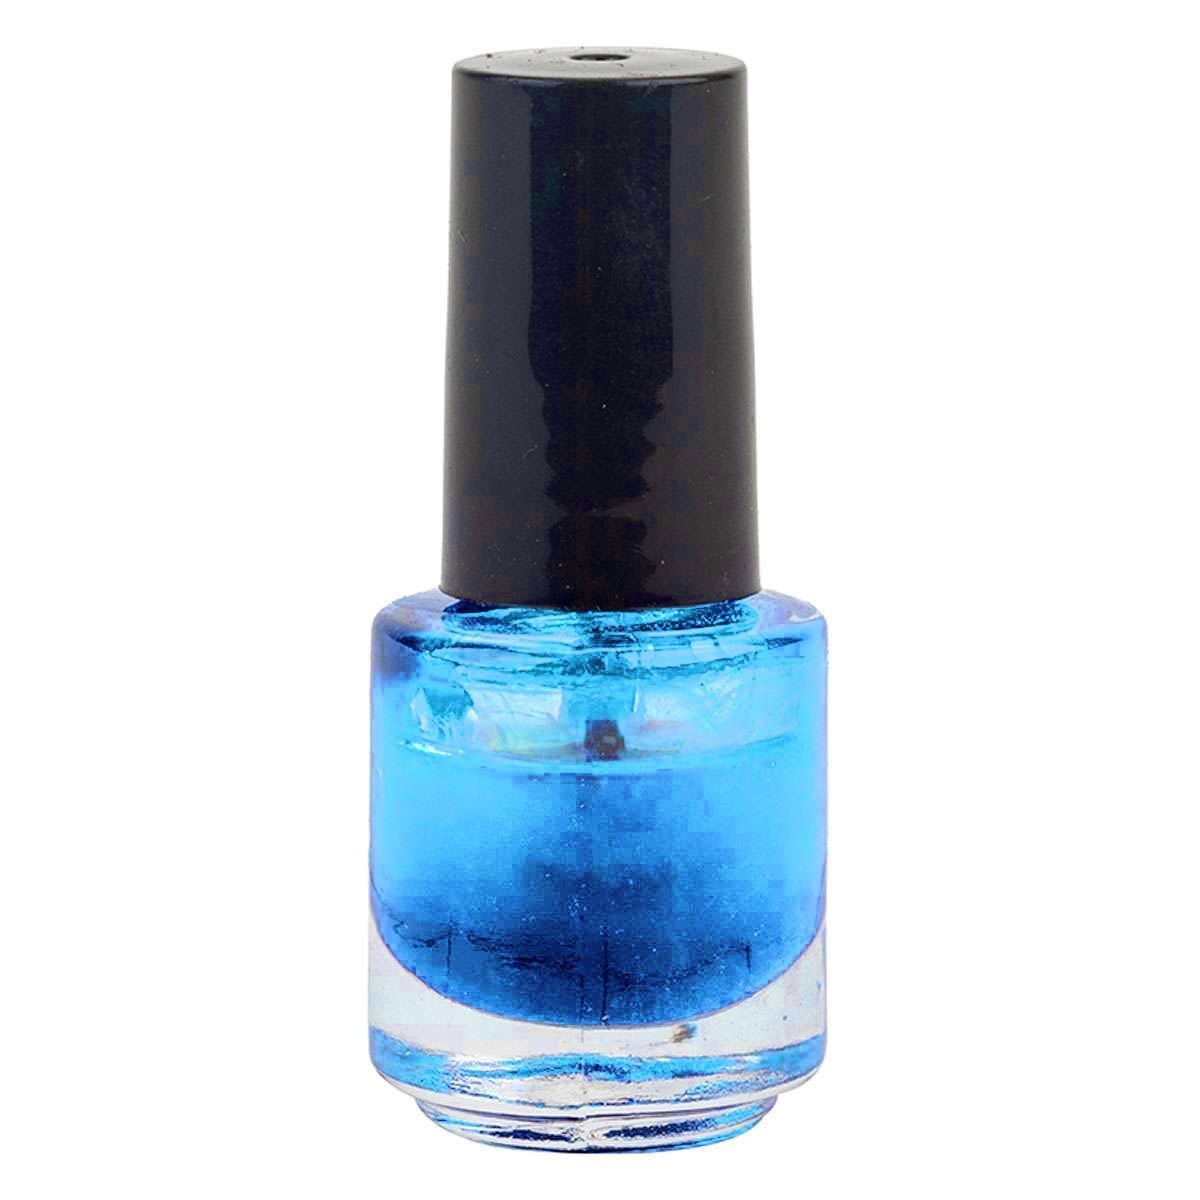 Bergstrom Lackfarbe PRL placid blue